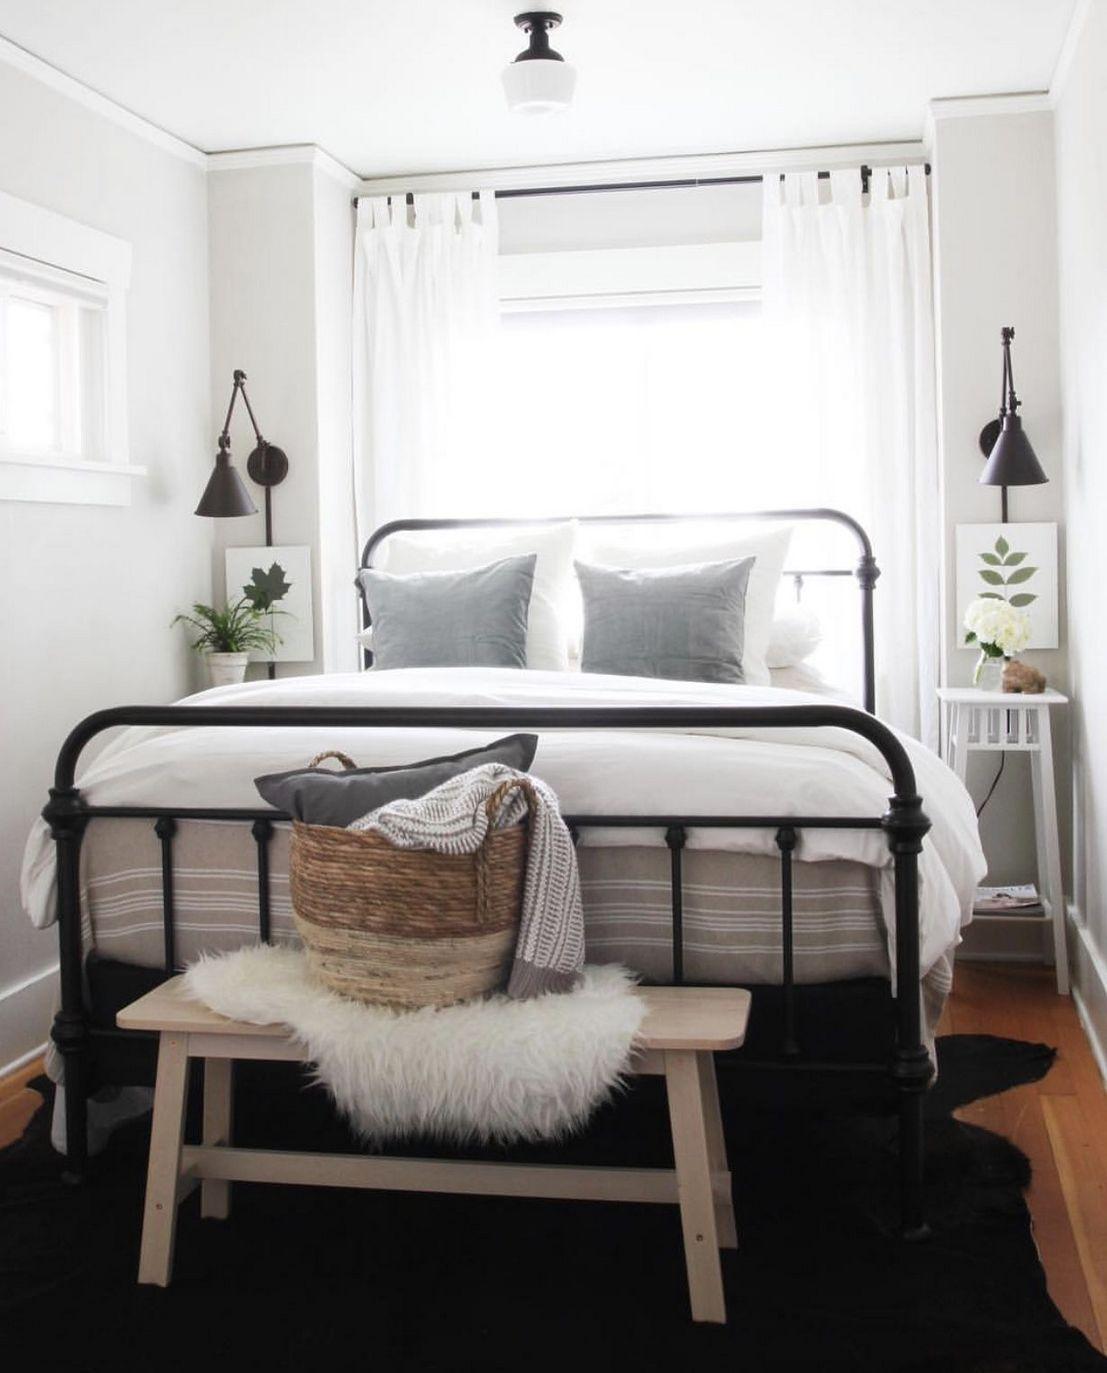 30 Spectacular Industrial Bedroom Decor Ideas Small Guest Bedroom Small Apartment Bedrooms Small Master Bedroom